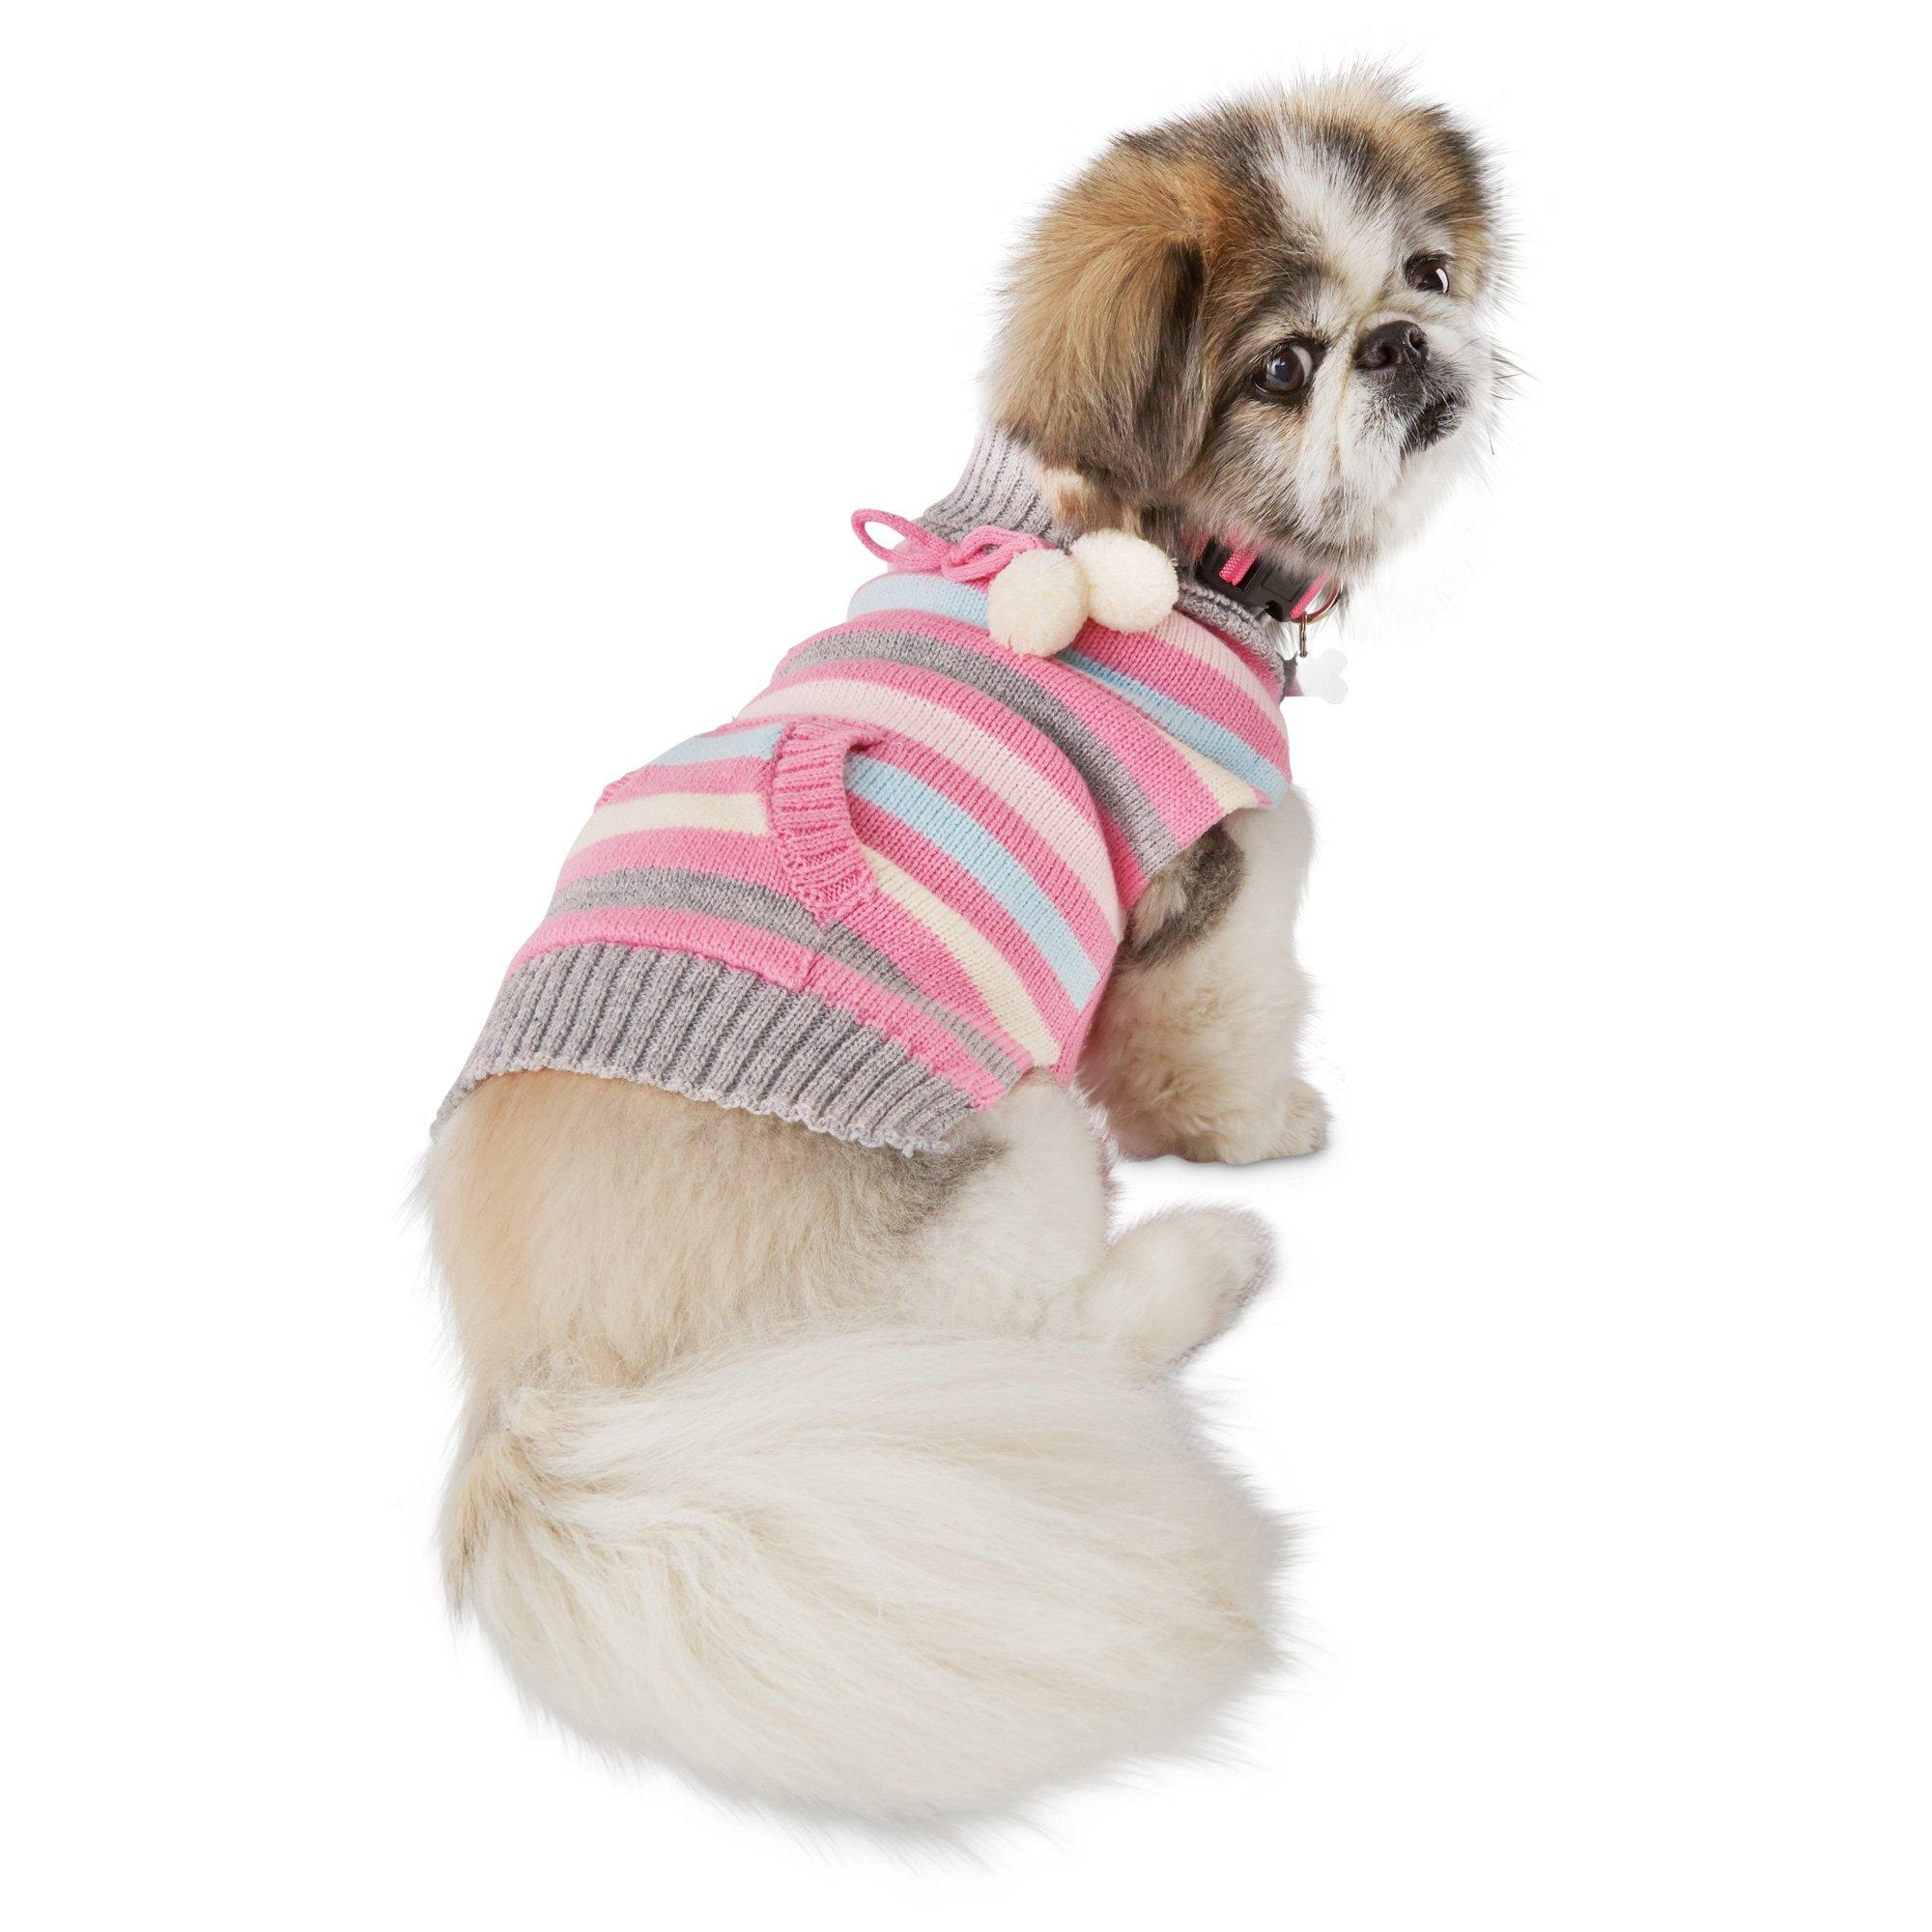 Smoochie Pooch Striped Cardigan Dog Sweater